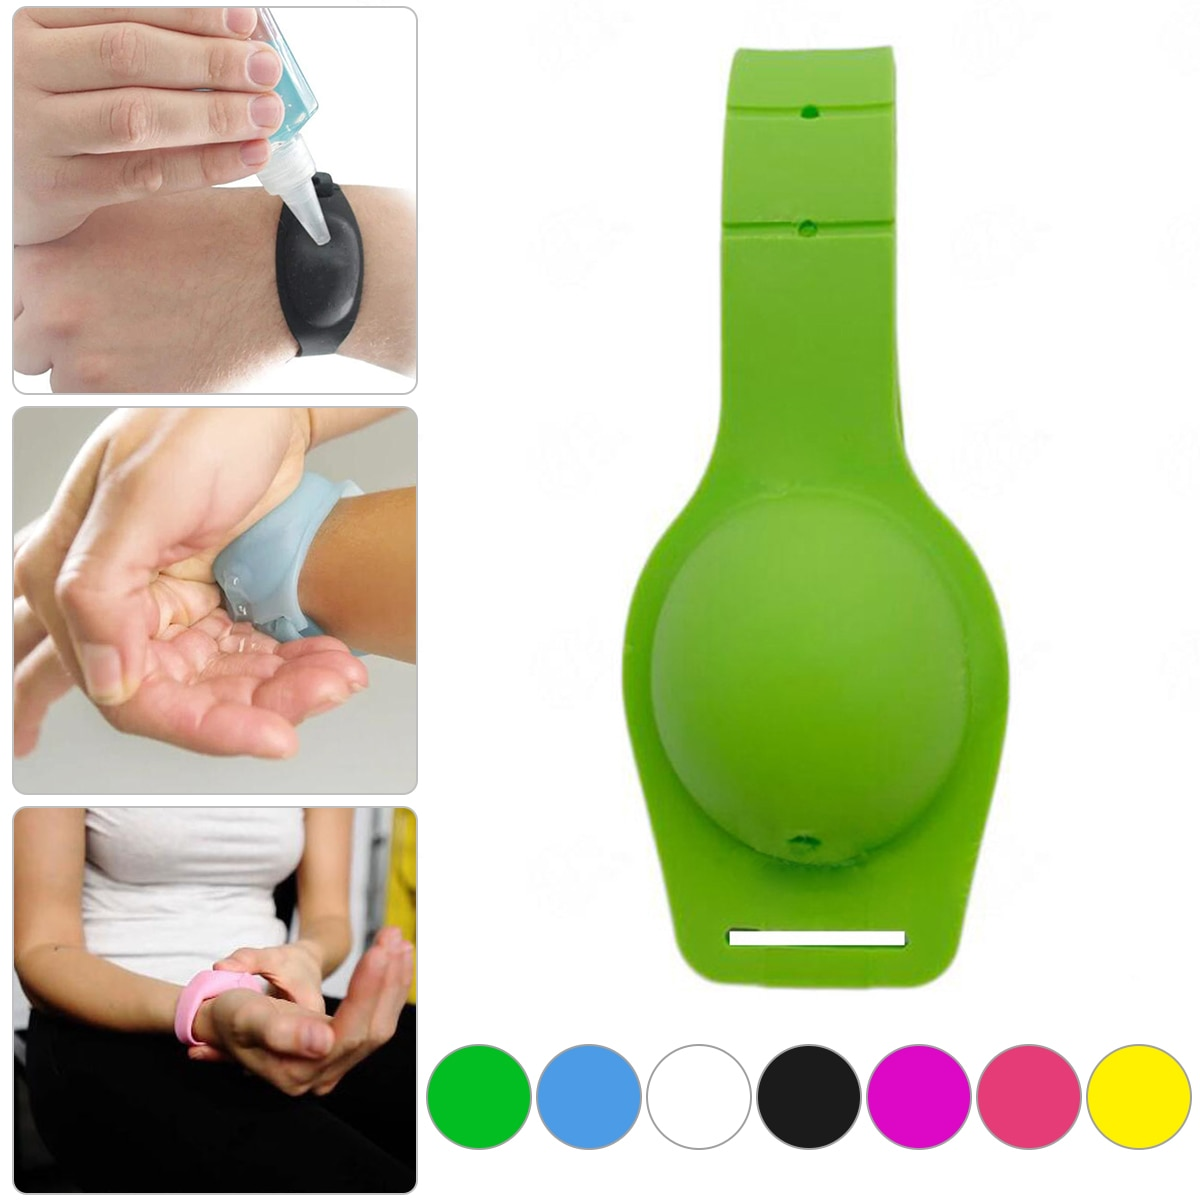 Sanitizer Bracelet Pumps Disinfectant Hand Sanitizer Dispensing Portable Silicone Bracelet Wristband Hand Dispenser